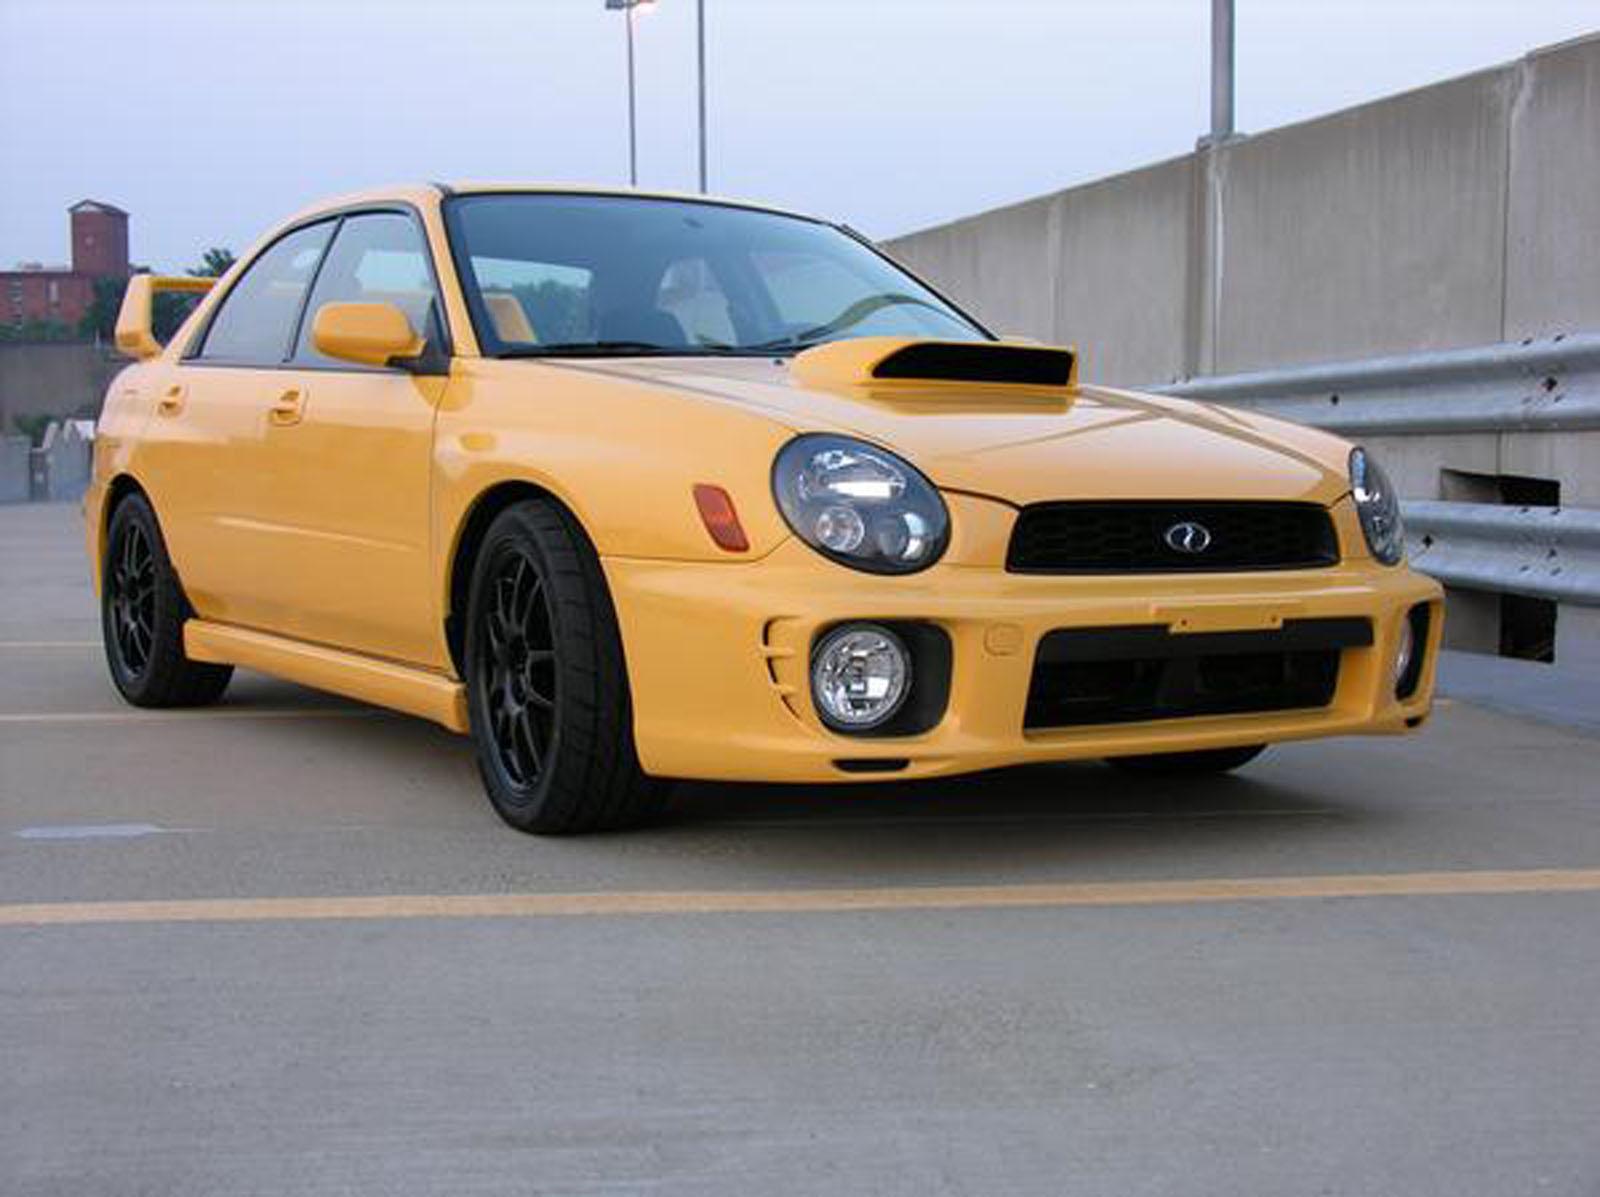 2003 Subaru Impreza Wrx For Sale Pittsburgh Pennsylvania